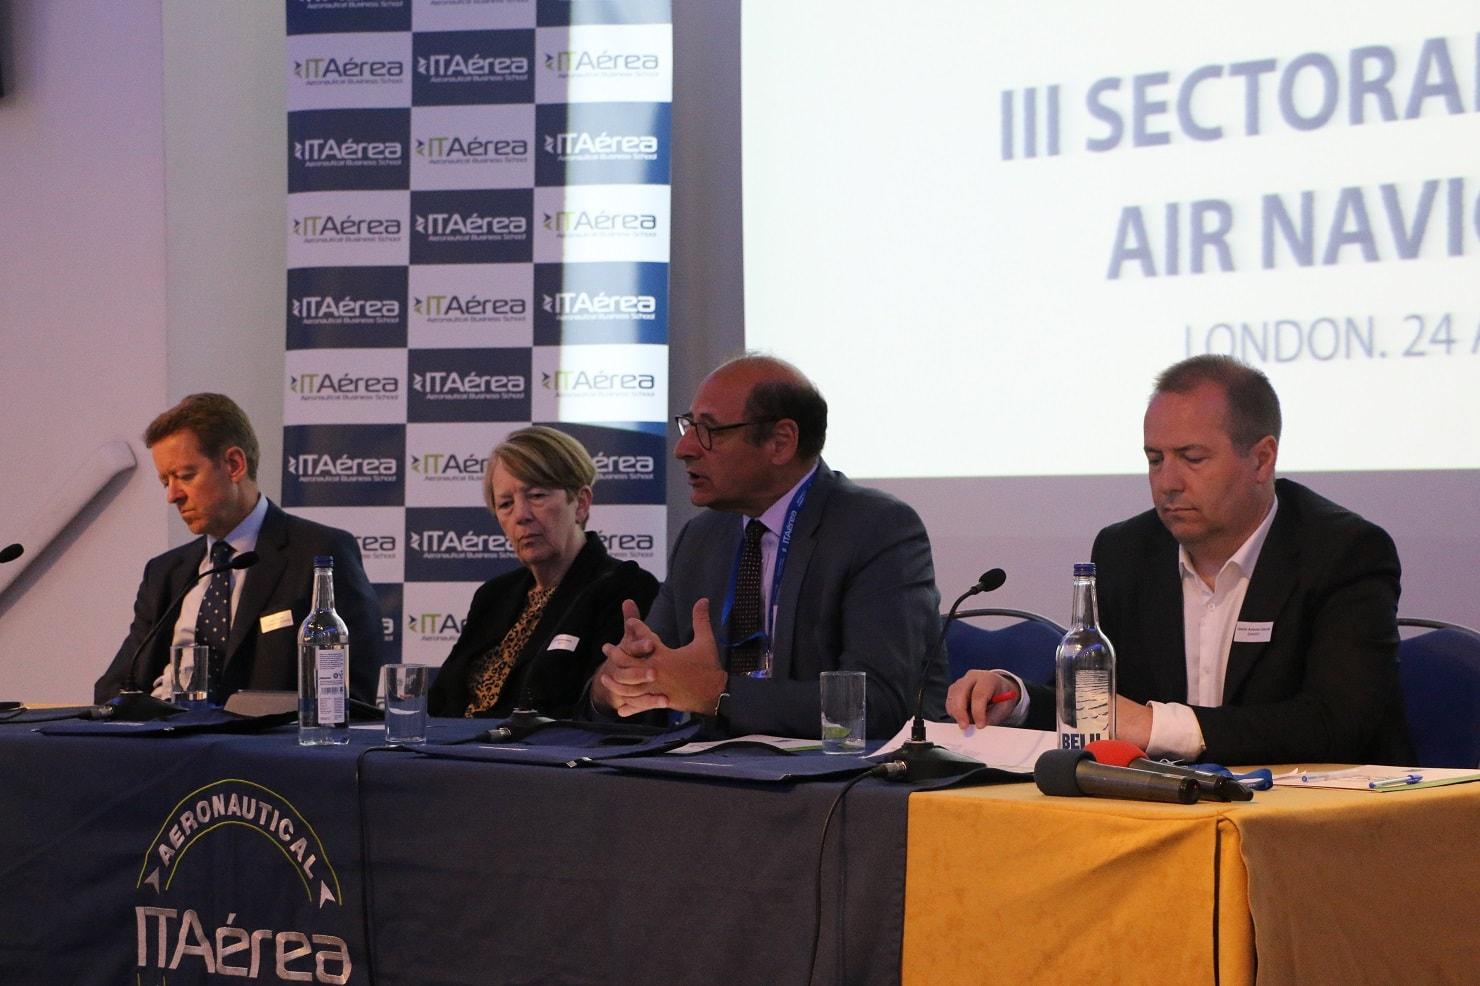 7 min - III Sector Meeting: Air Navigation